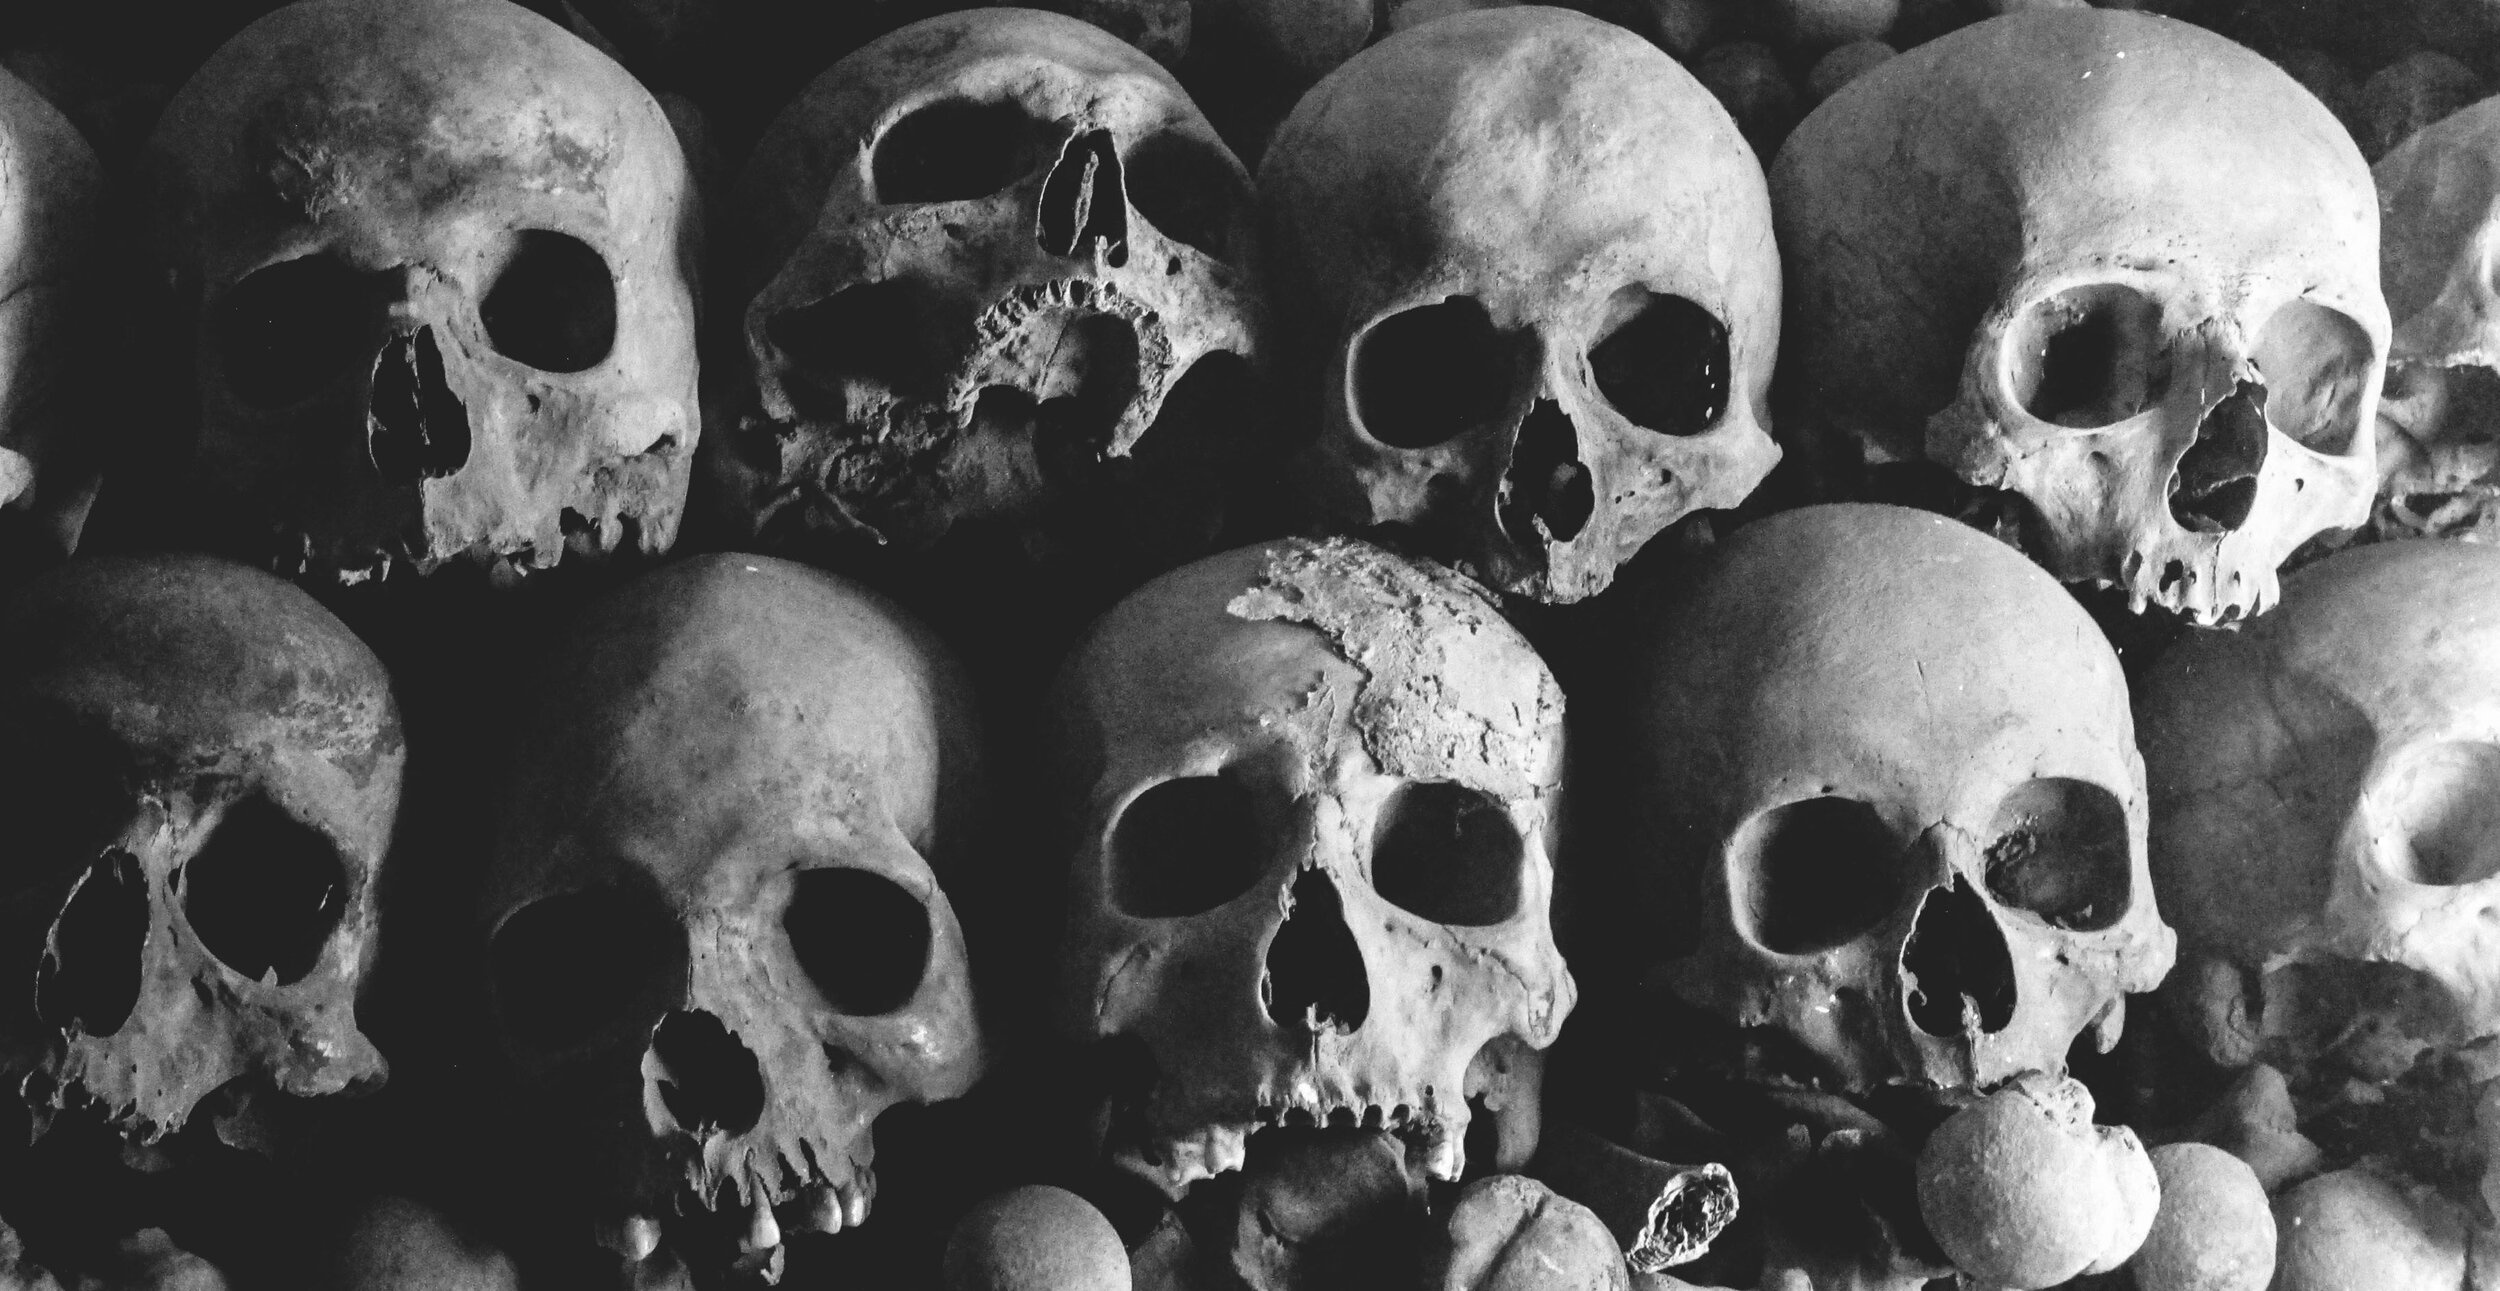 black-and-white-black-and-white-bones-2747893.jpg